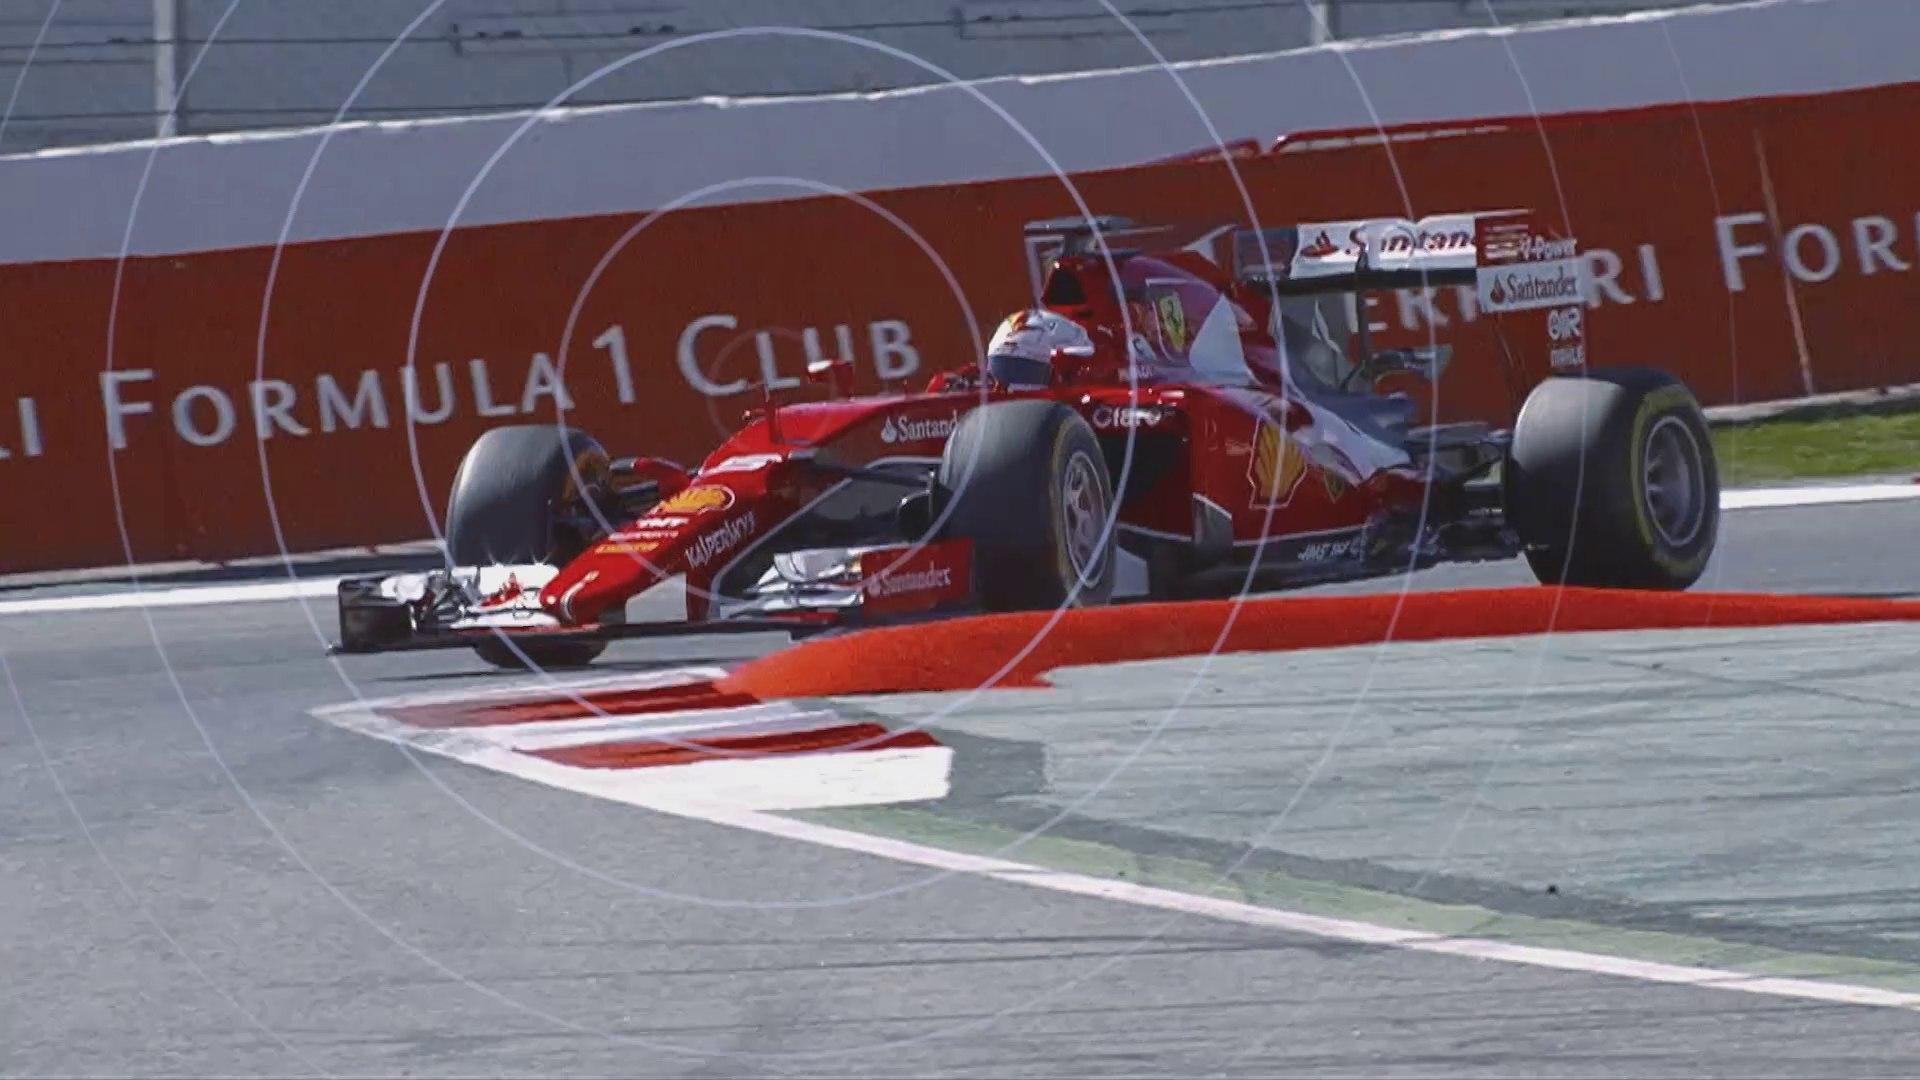 F1 Technology